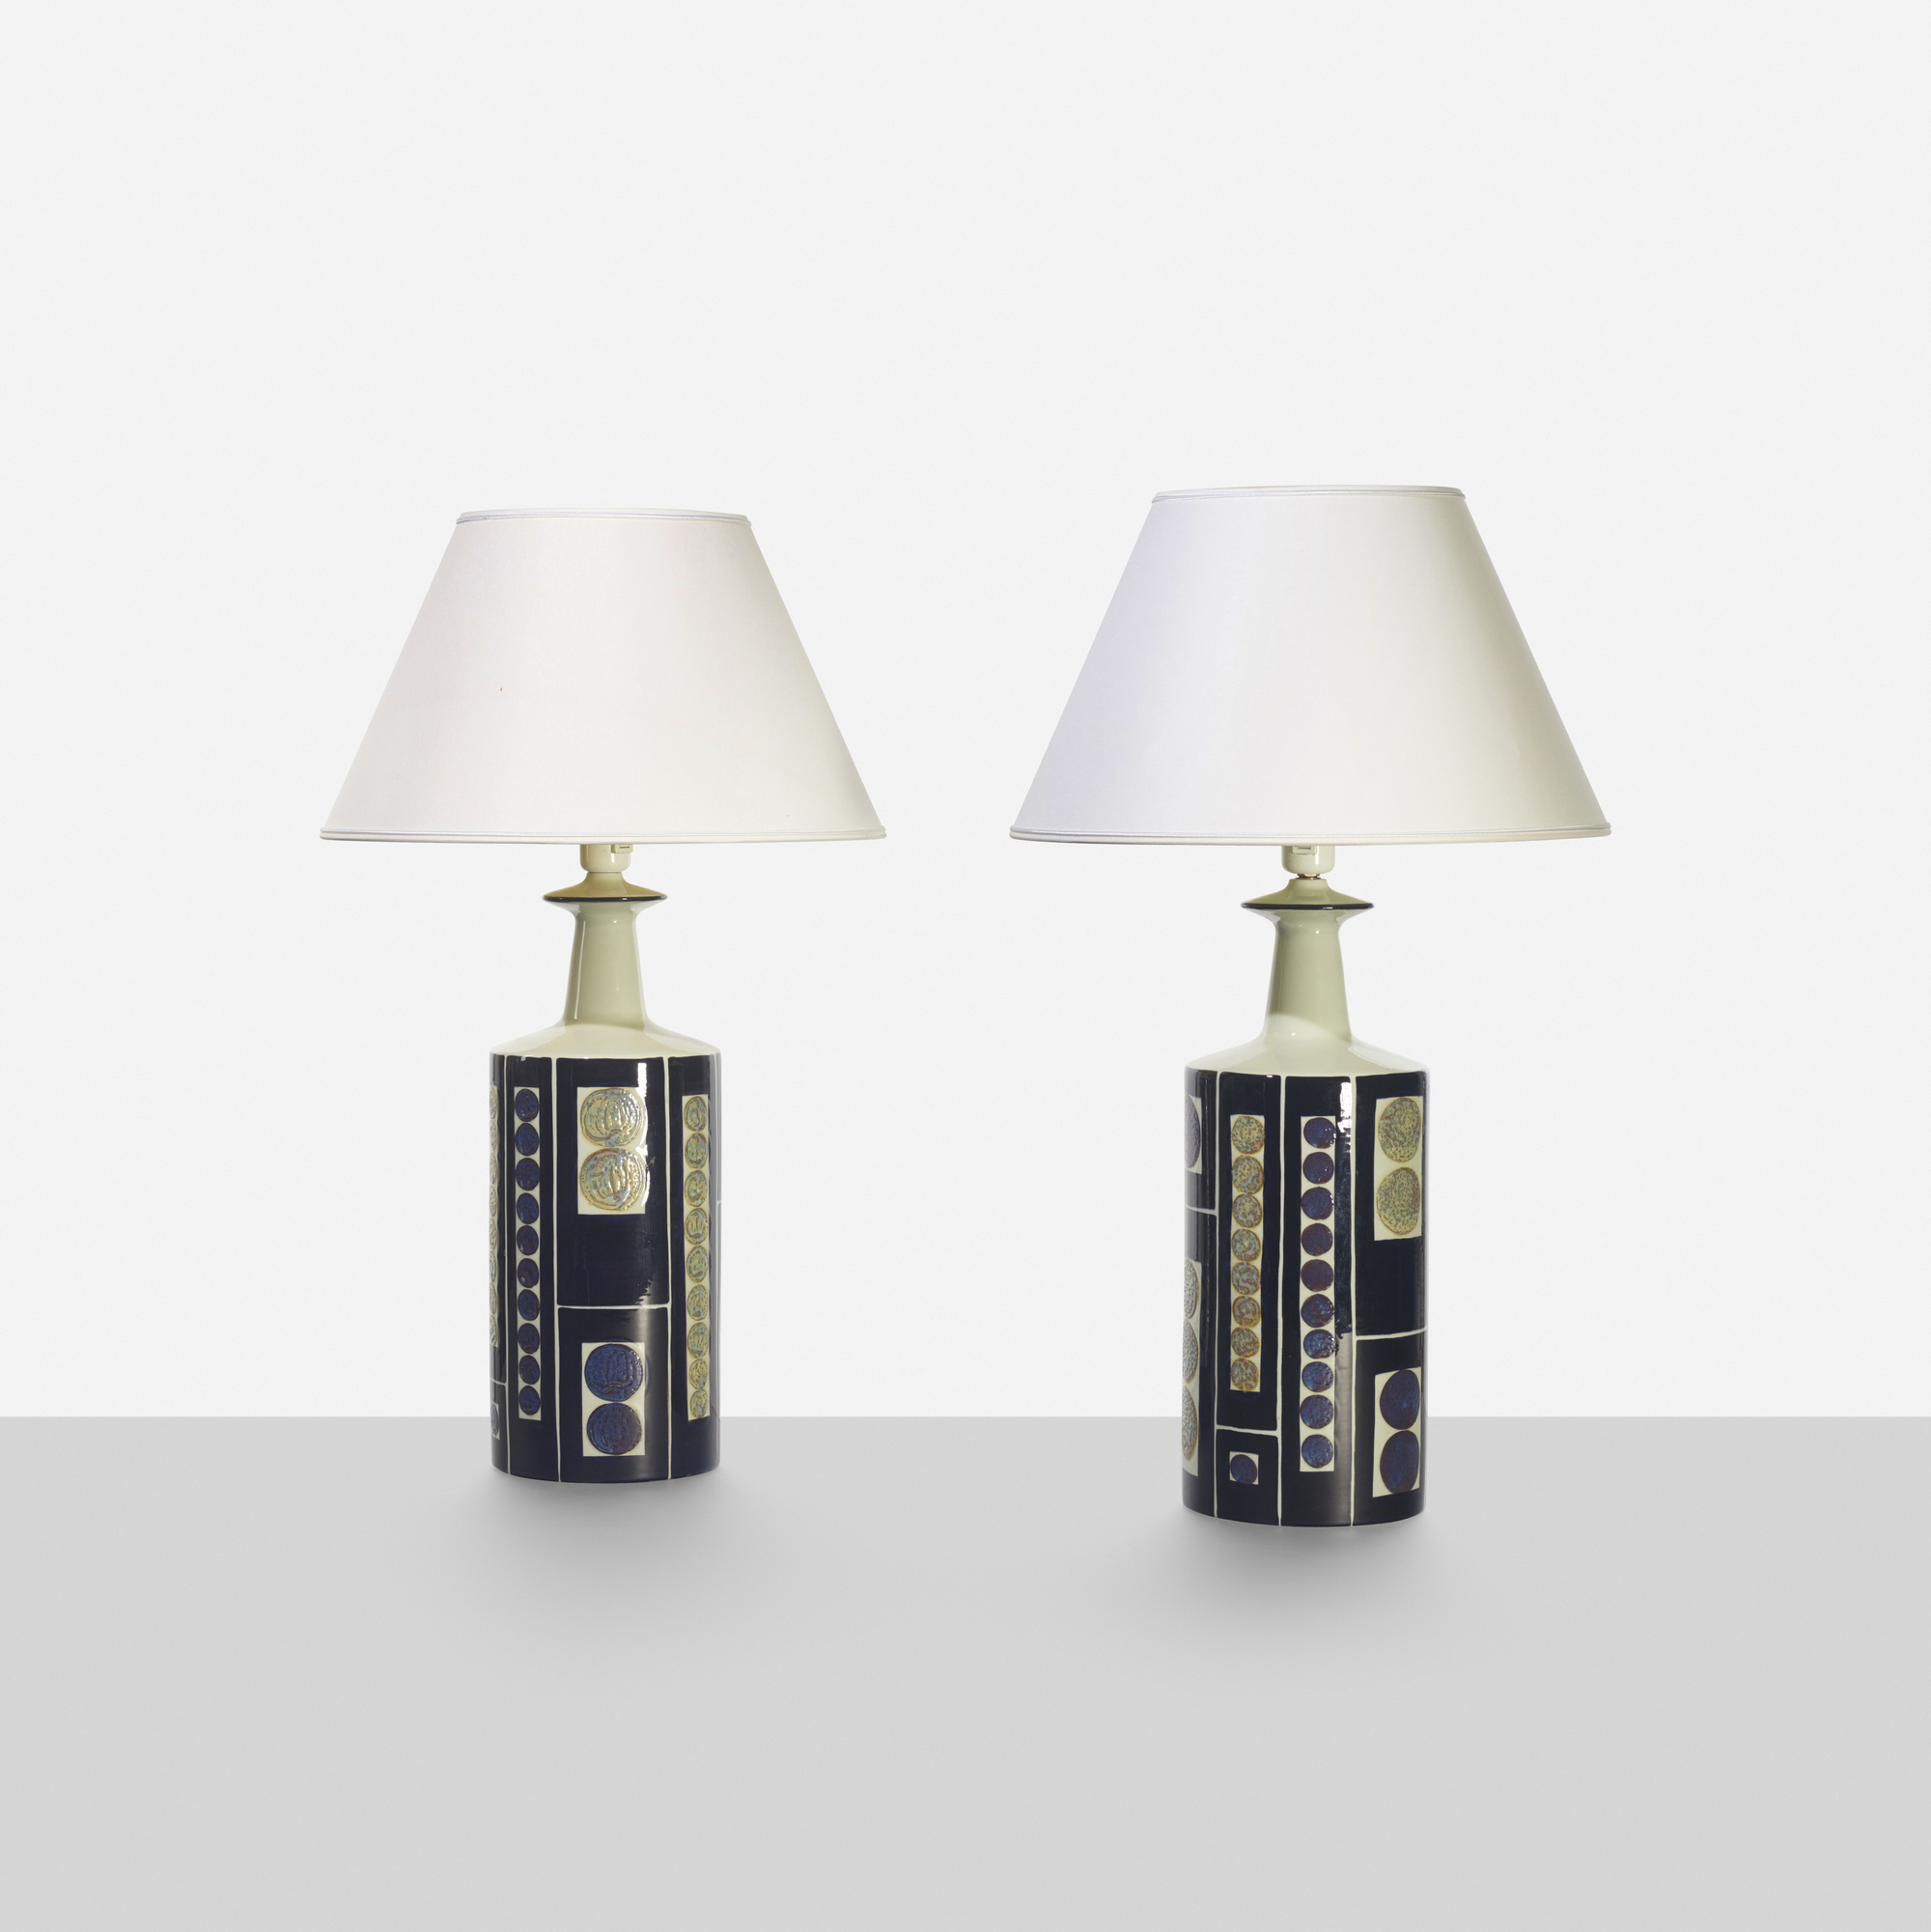 202: Royal Copenhagen / table lamps, pair (2 of 4)